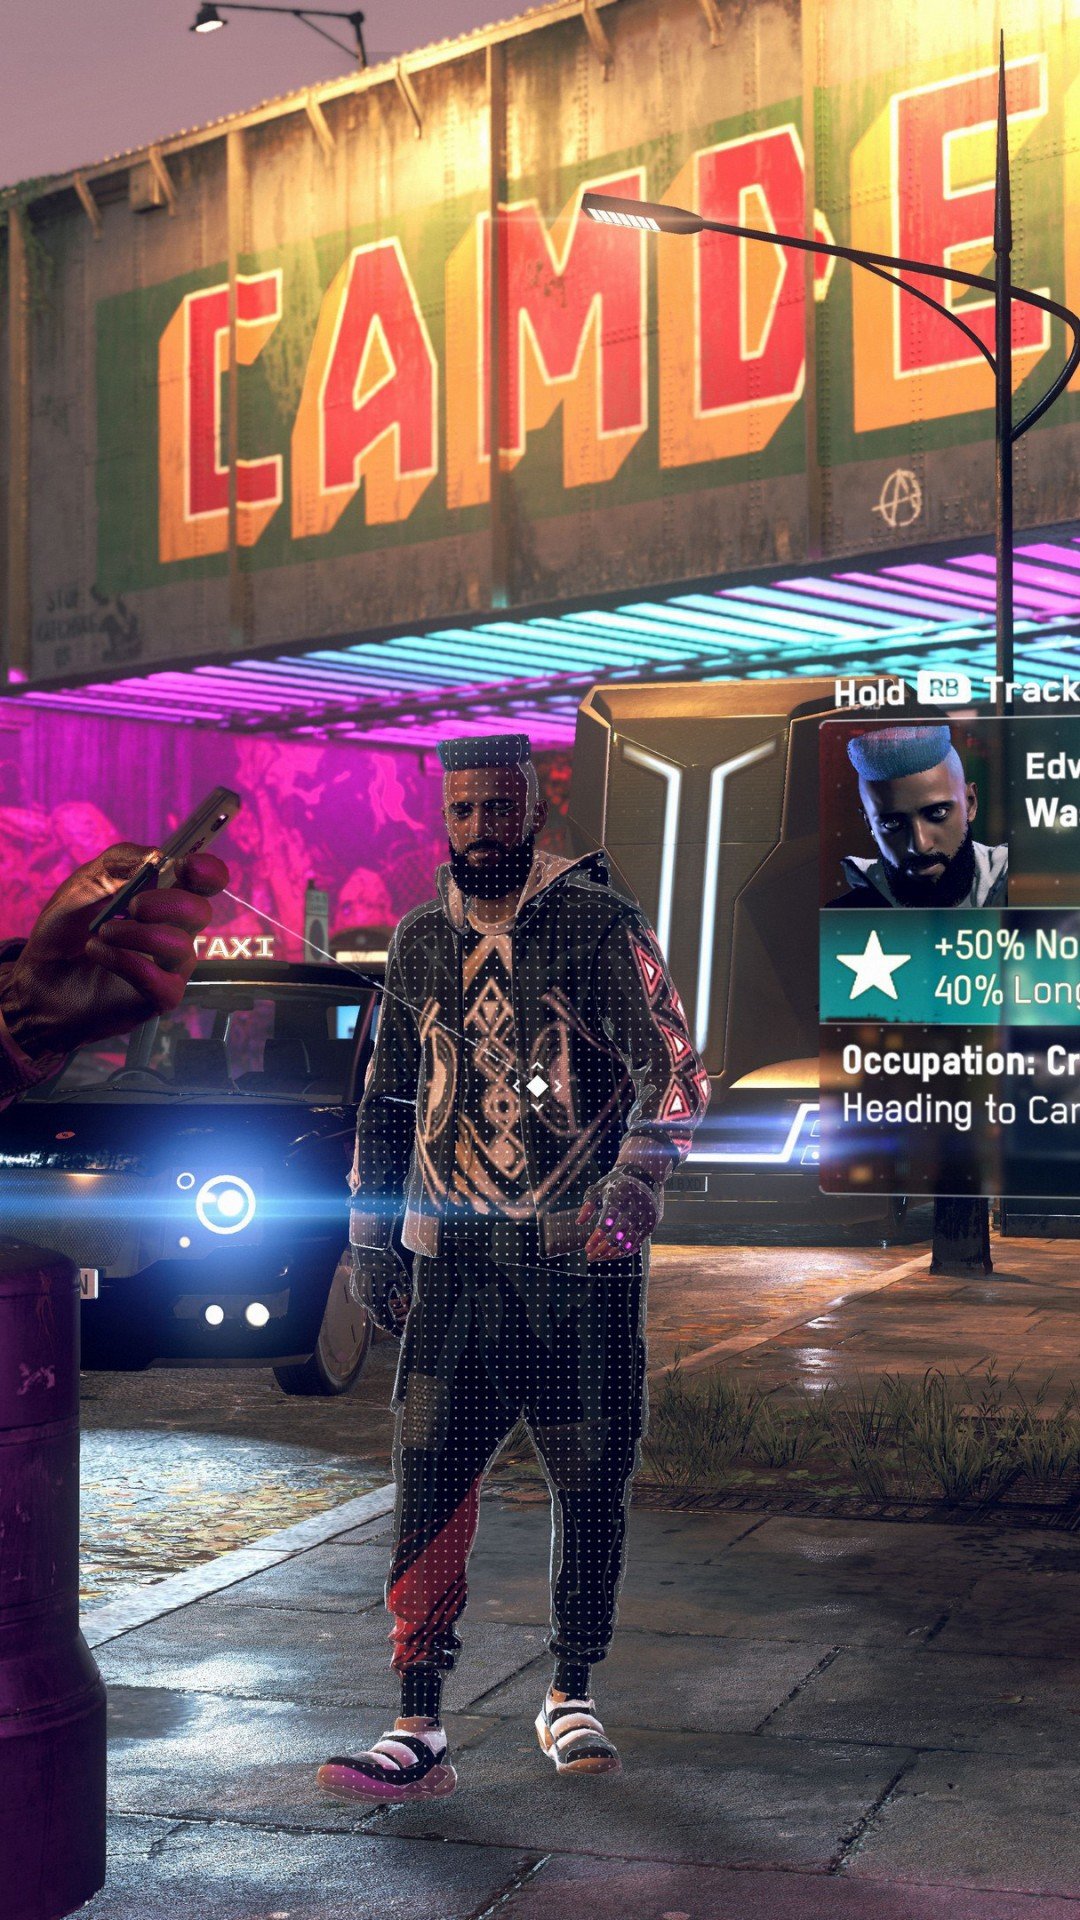 Wallpaper Watch Dogs Legion E3 2019 screenshot 4K